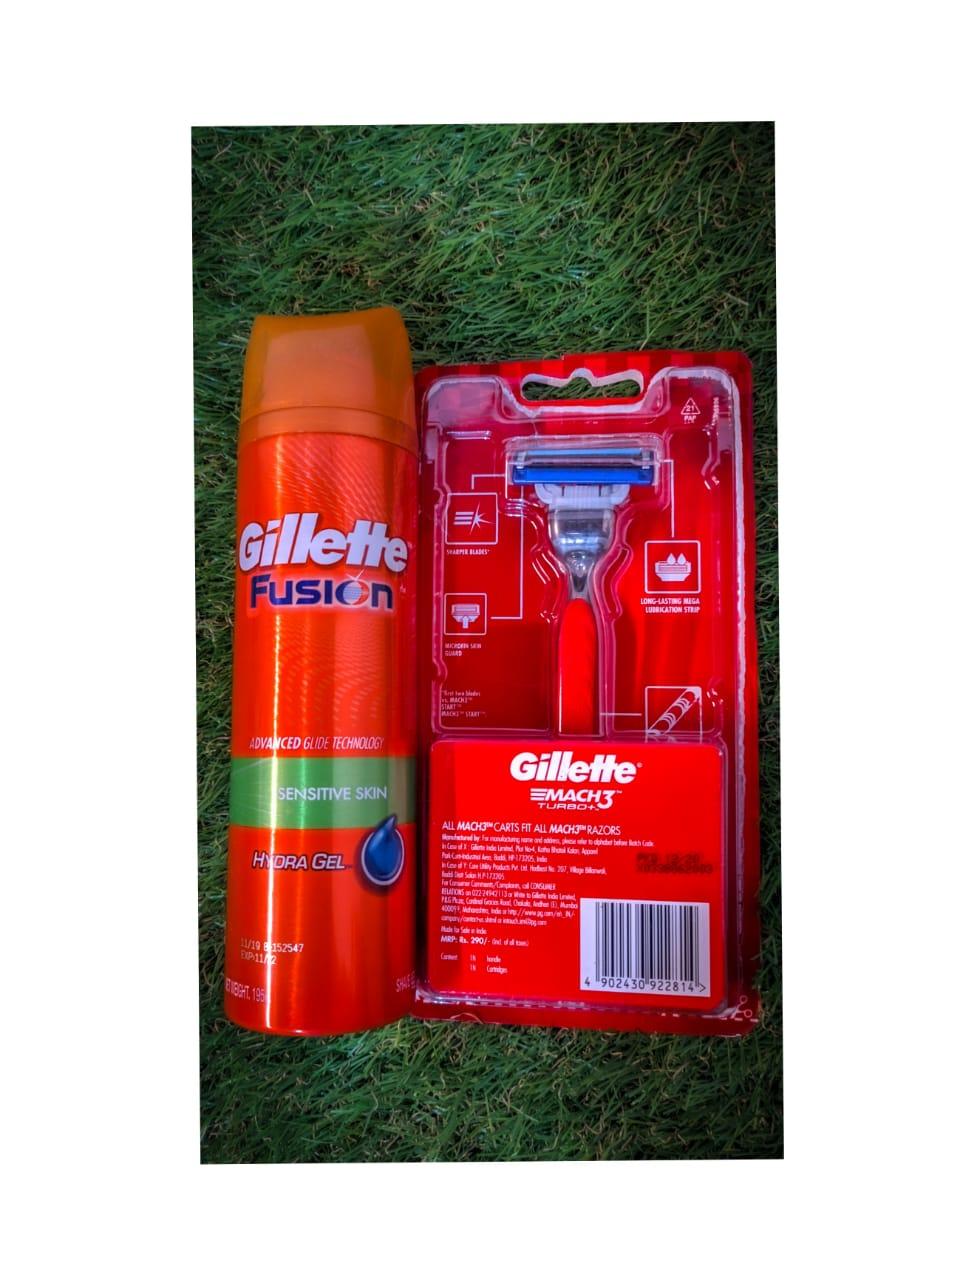 Gillette Fusion Hydra Gel Sensitive Pre Shave Gel-Man Product-By rishav_sharma-1